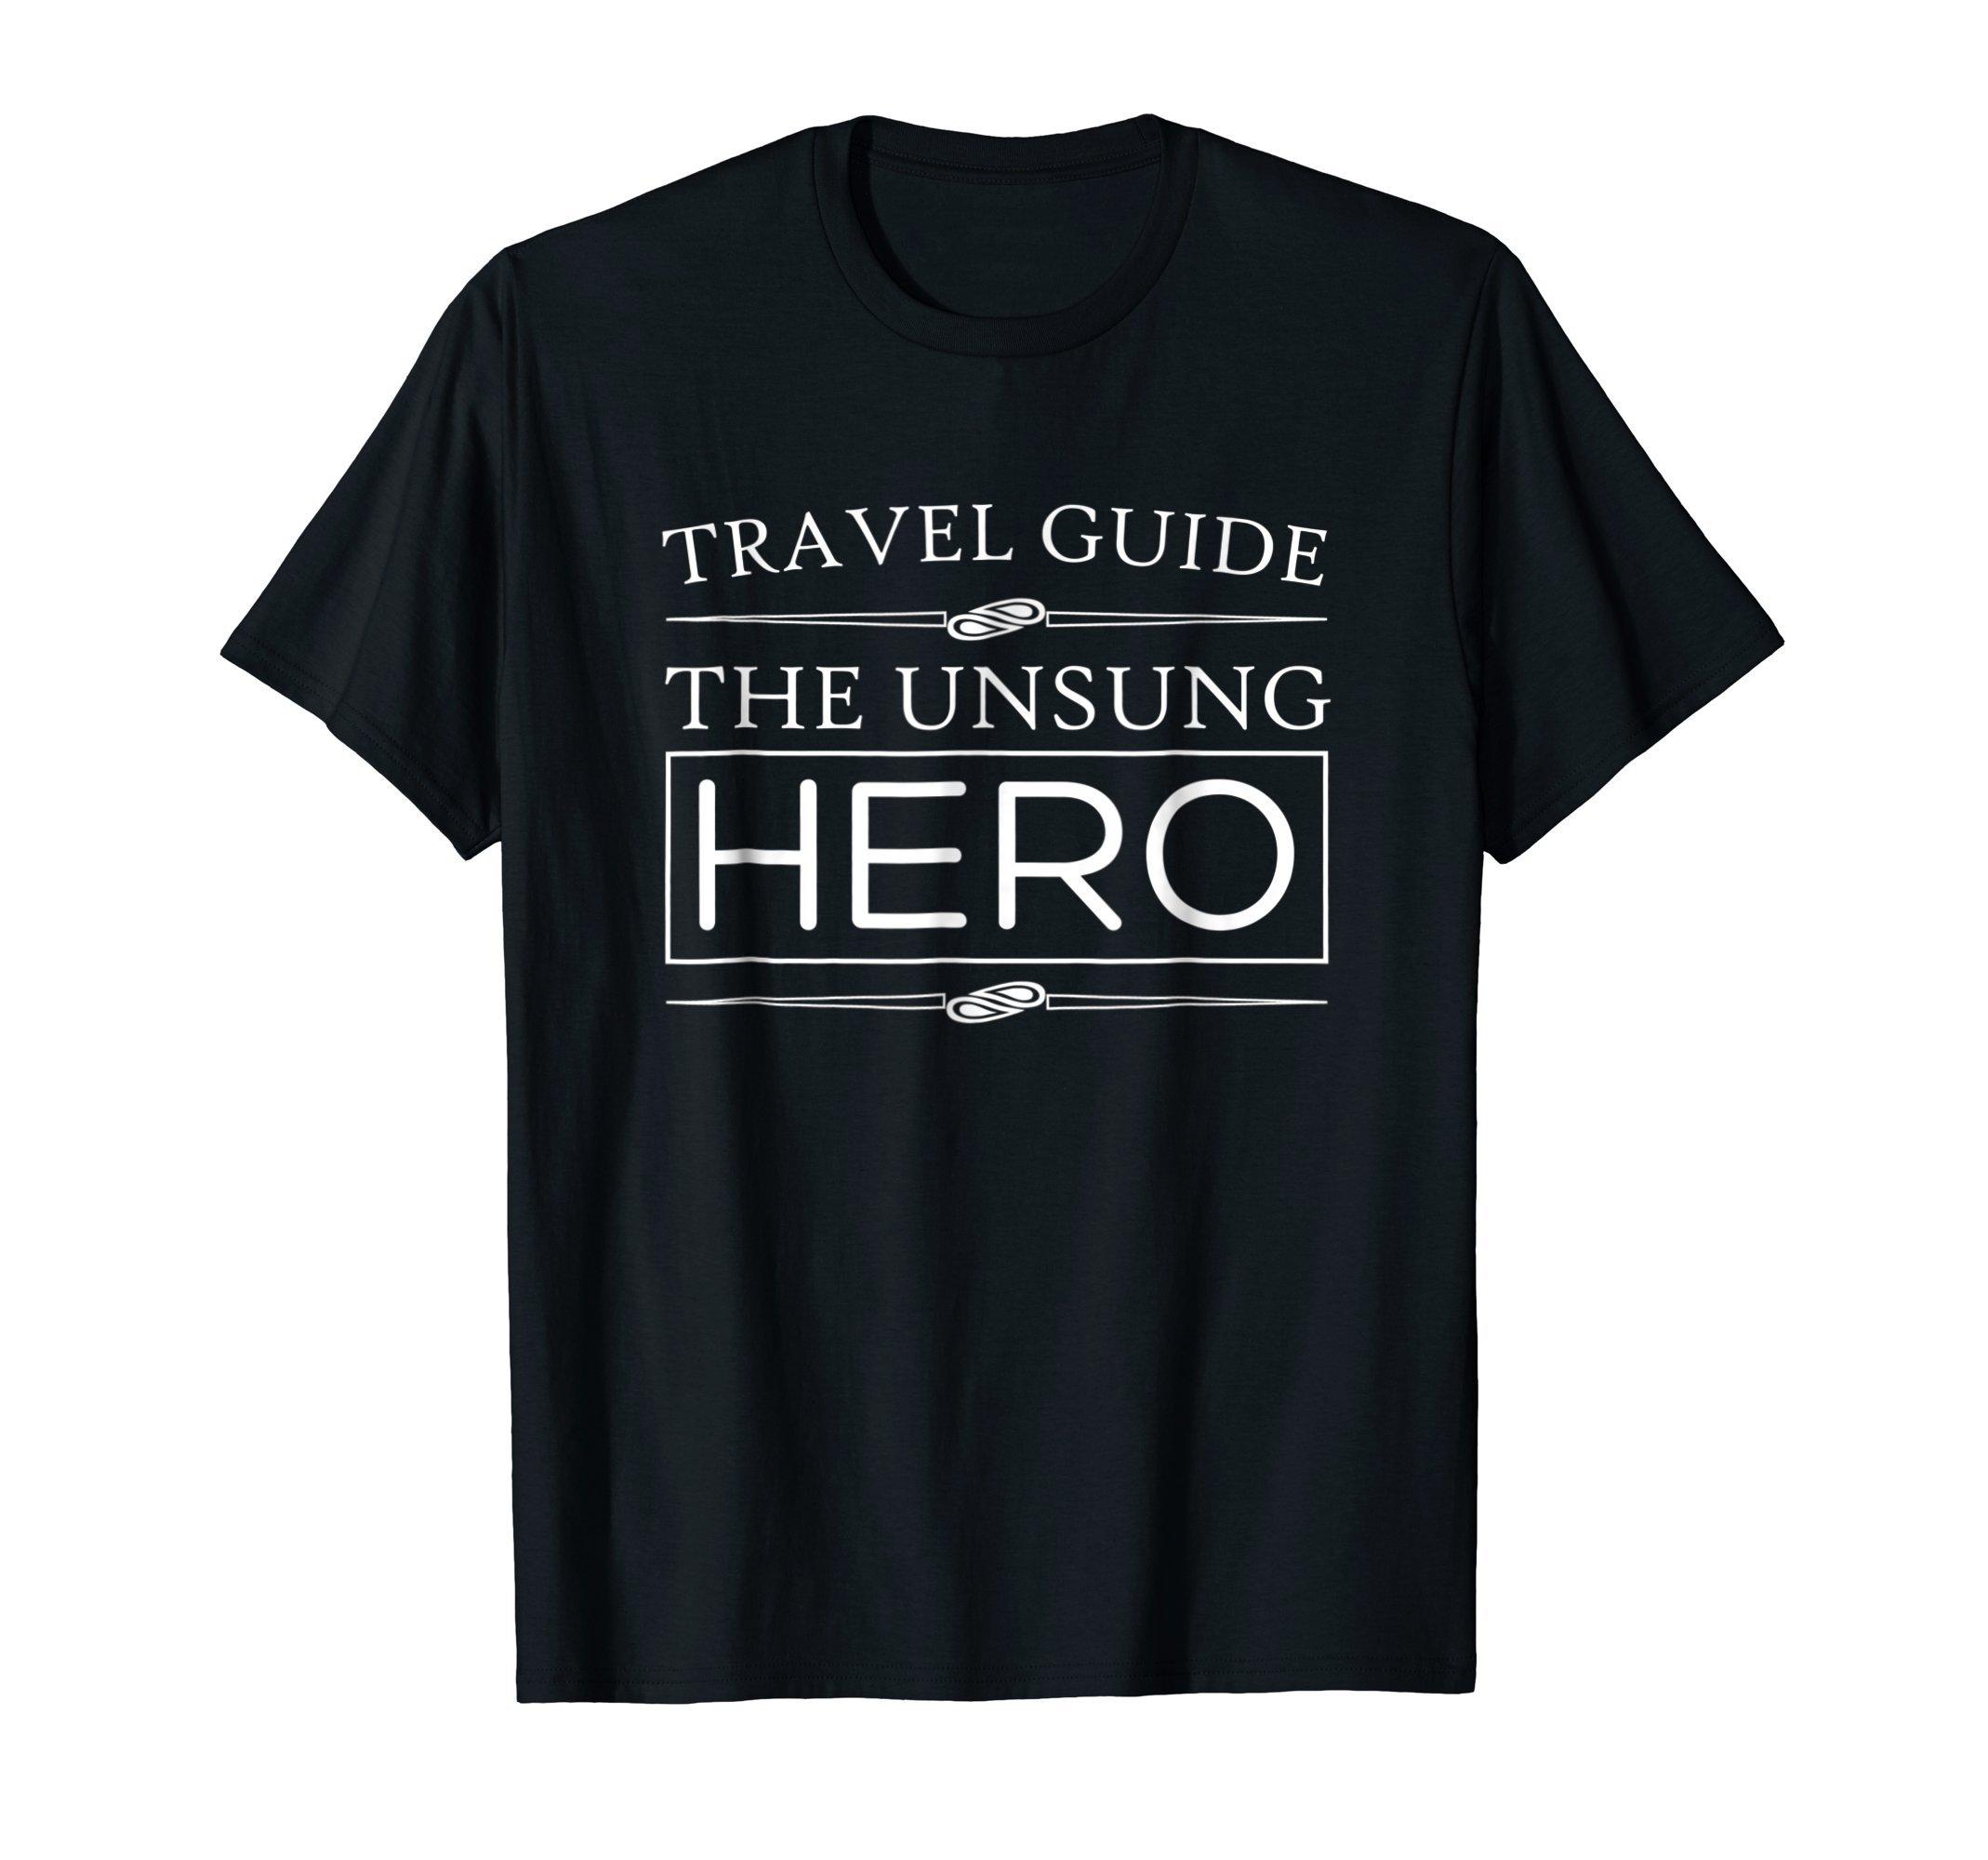 Travel Guide Unsung Hero Shirt, Funny Tour Guide Gift